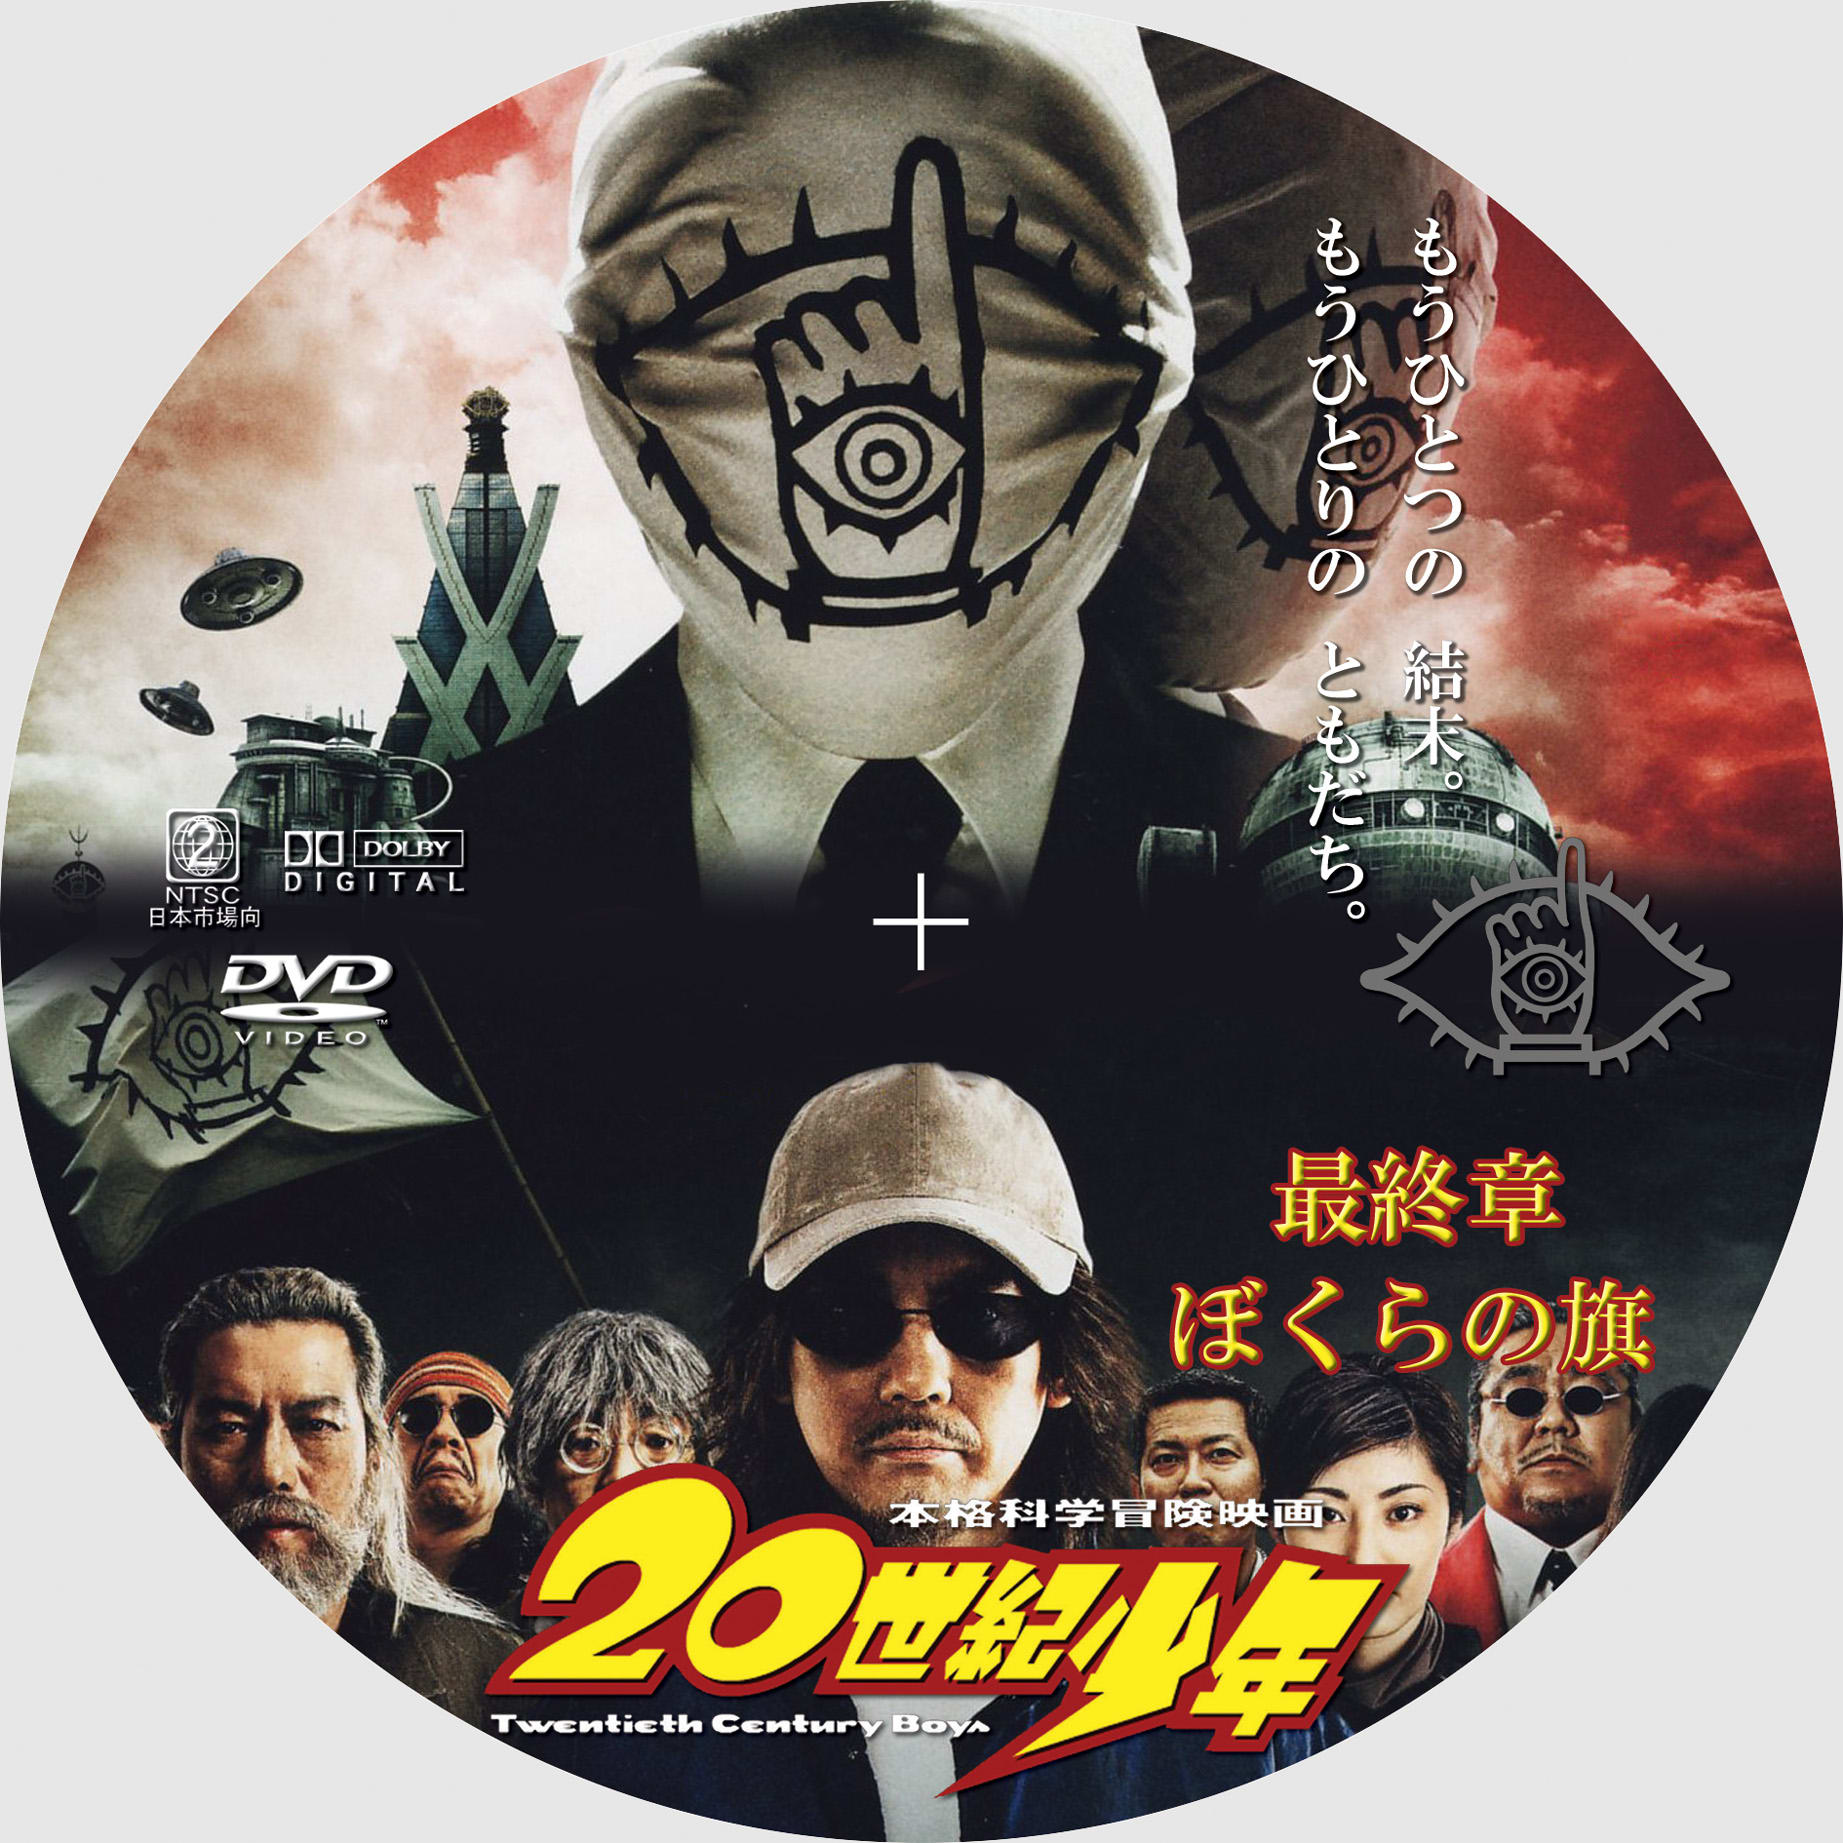 DVD レーベル 20世紀少年 最終章 ・・・等